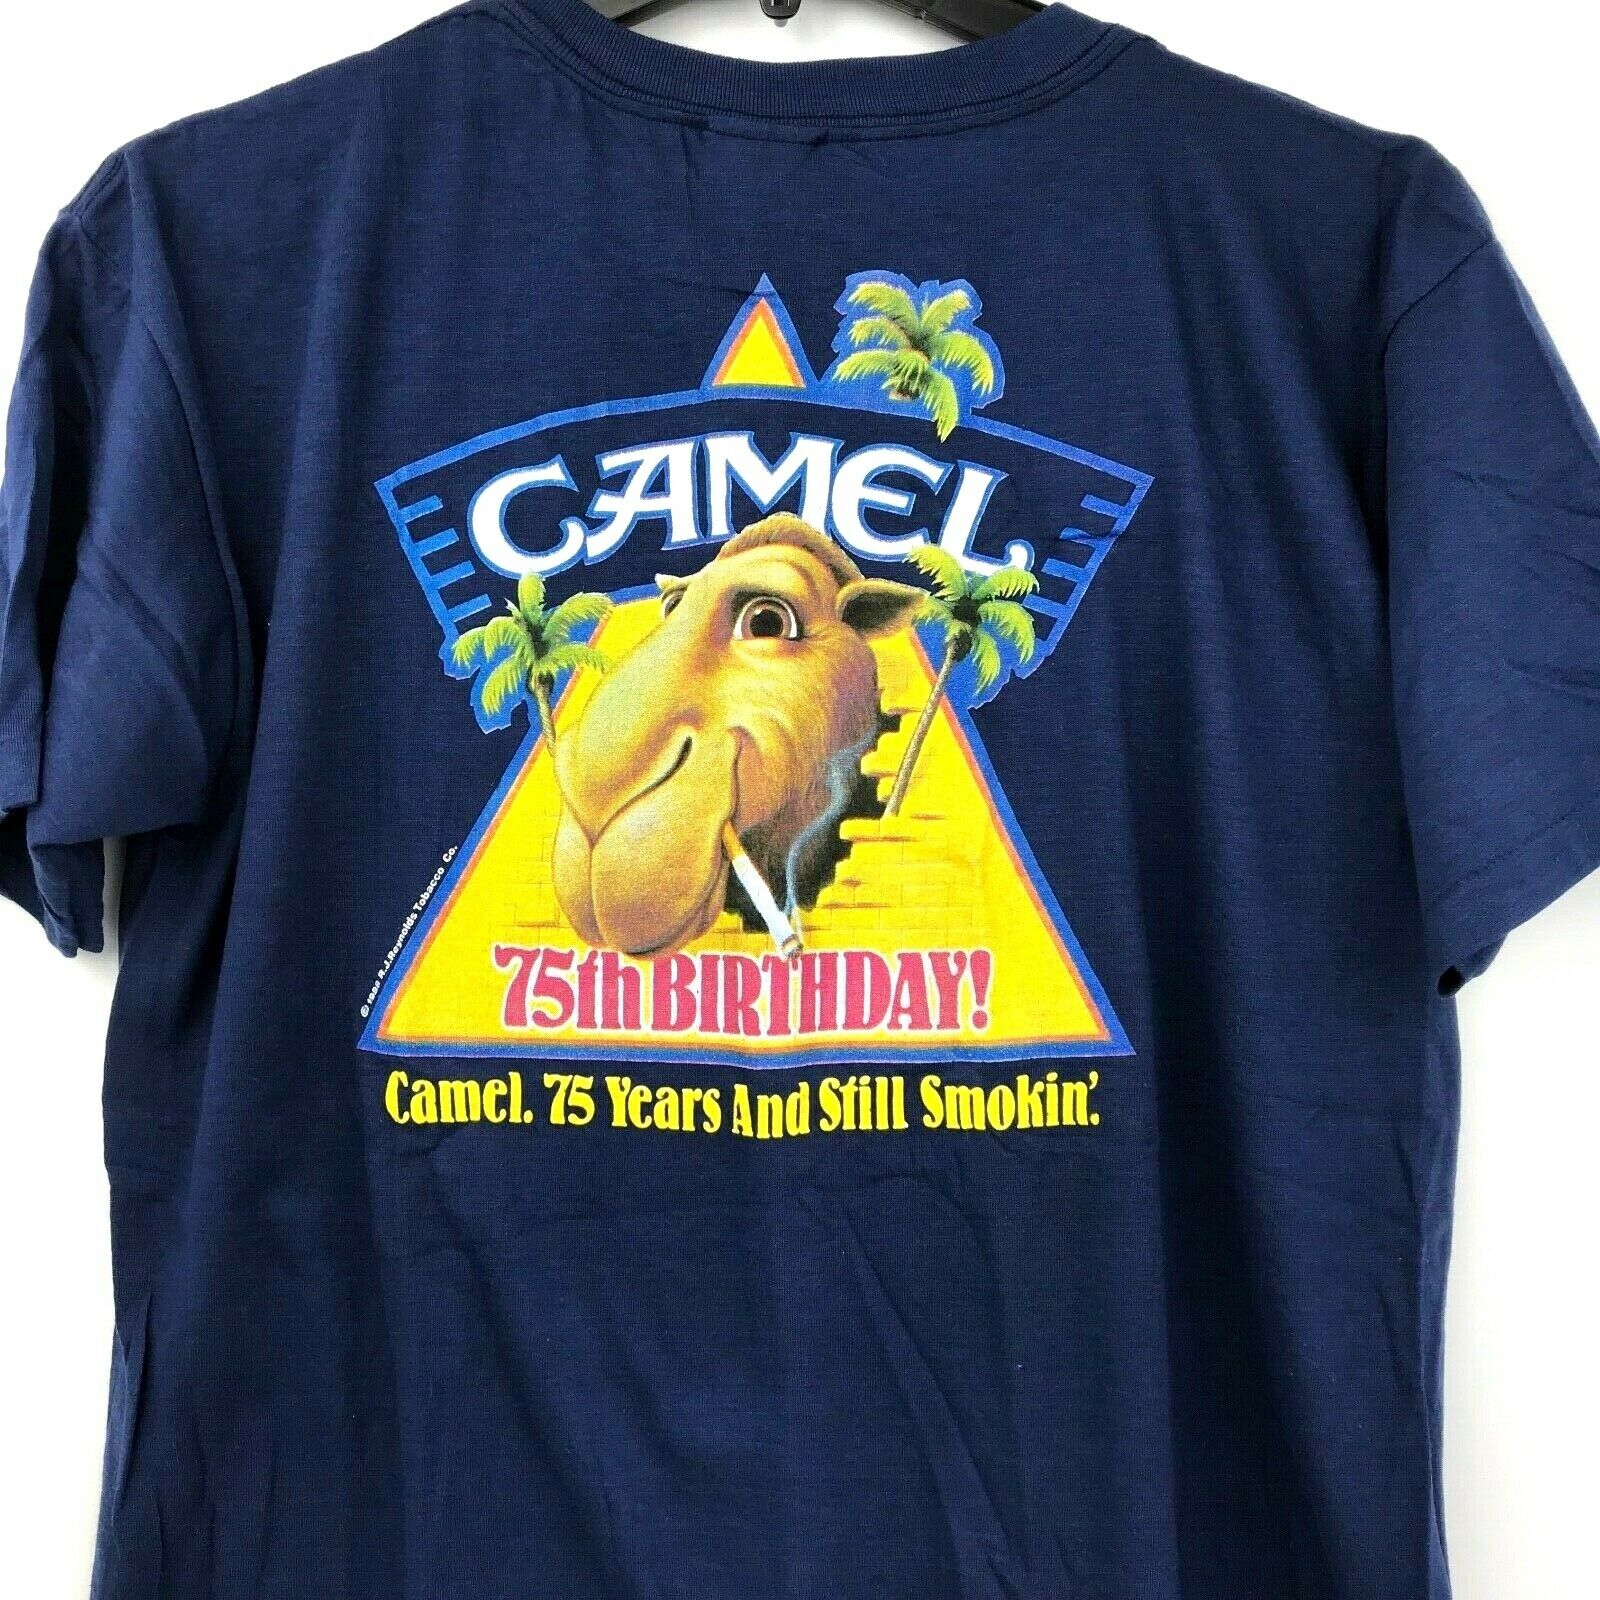 75th Anniversary Camel T Shirt 1988 Vintage Authentic RJ Reynolds Tobacco Co